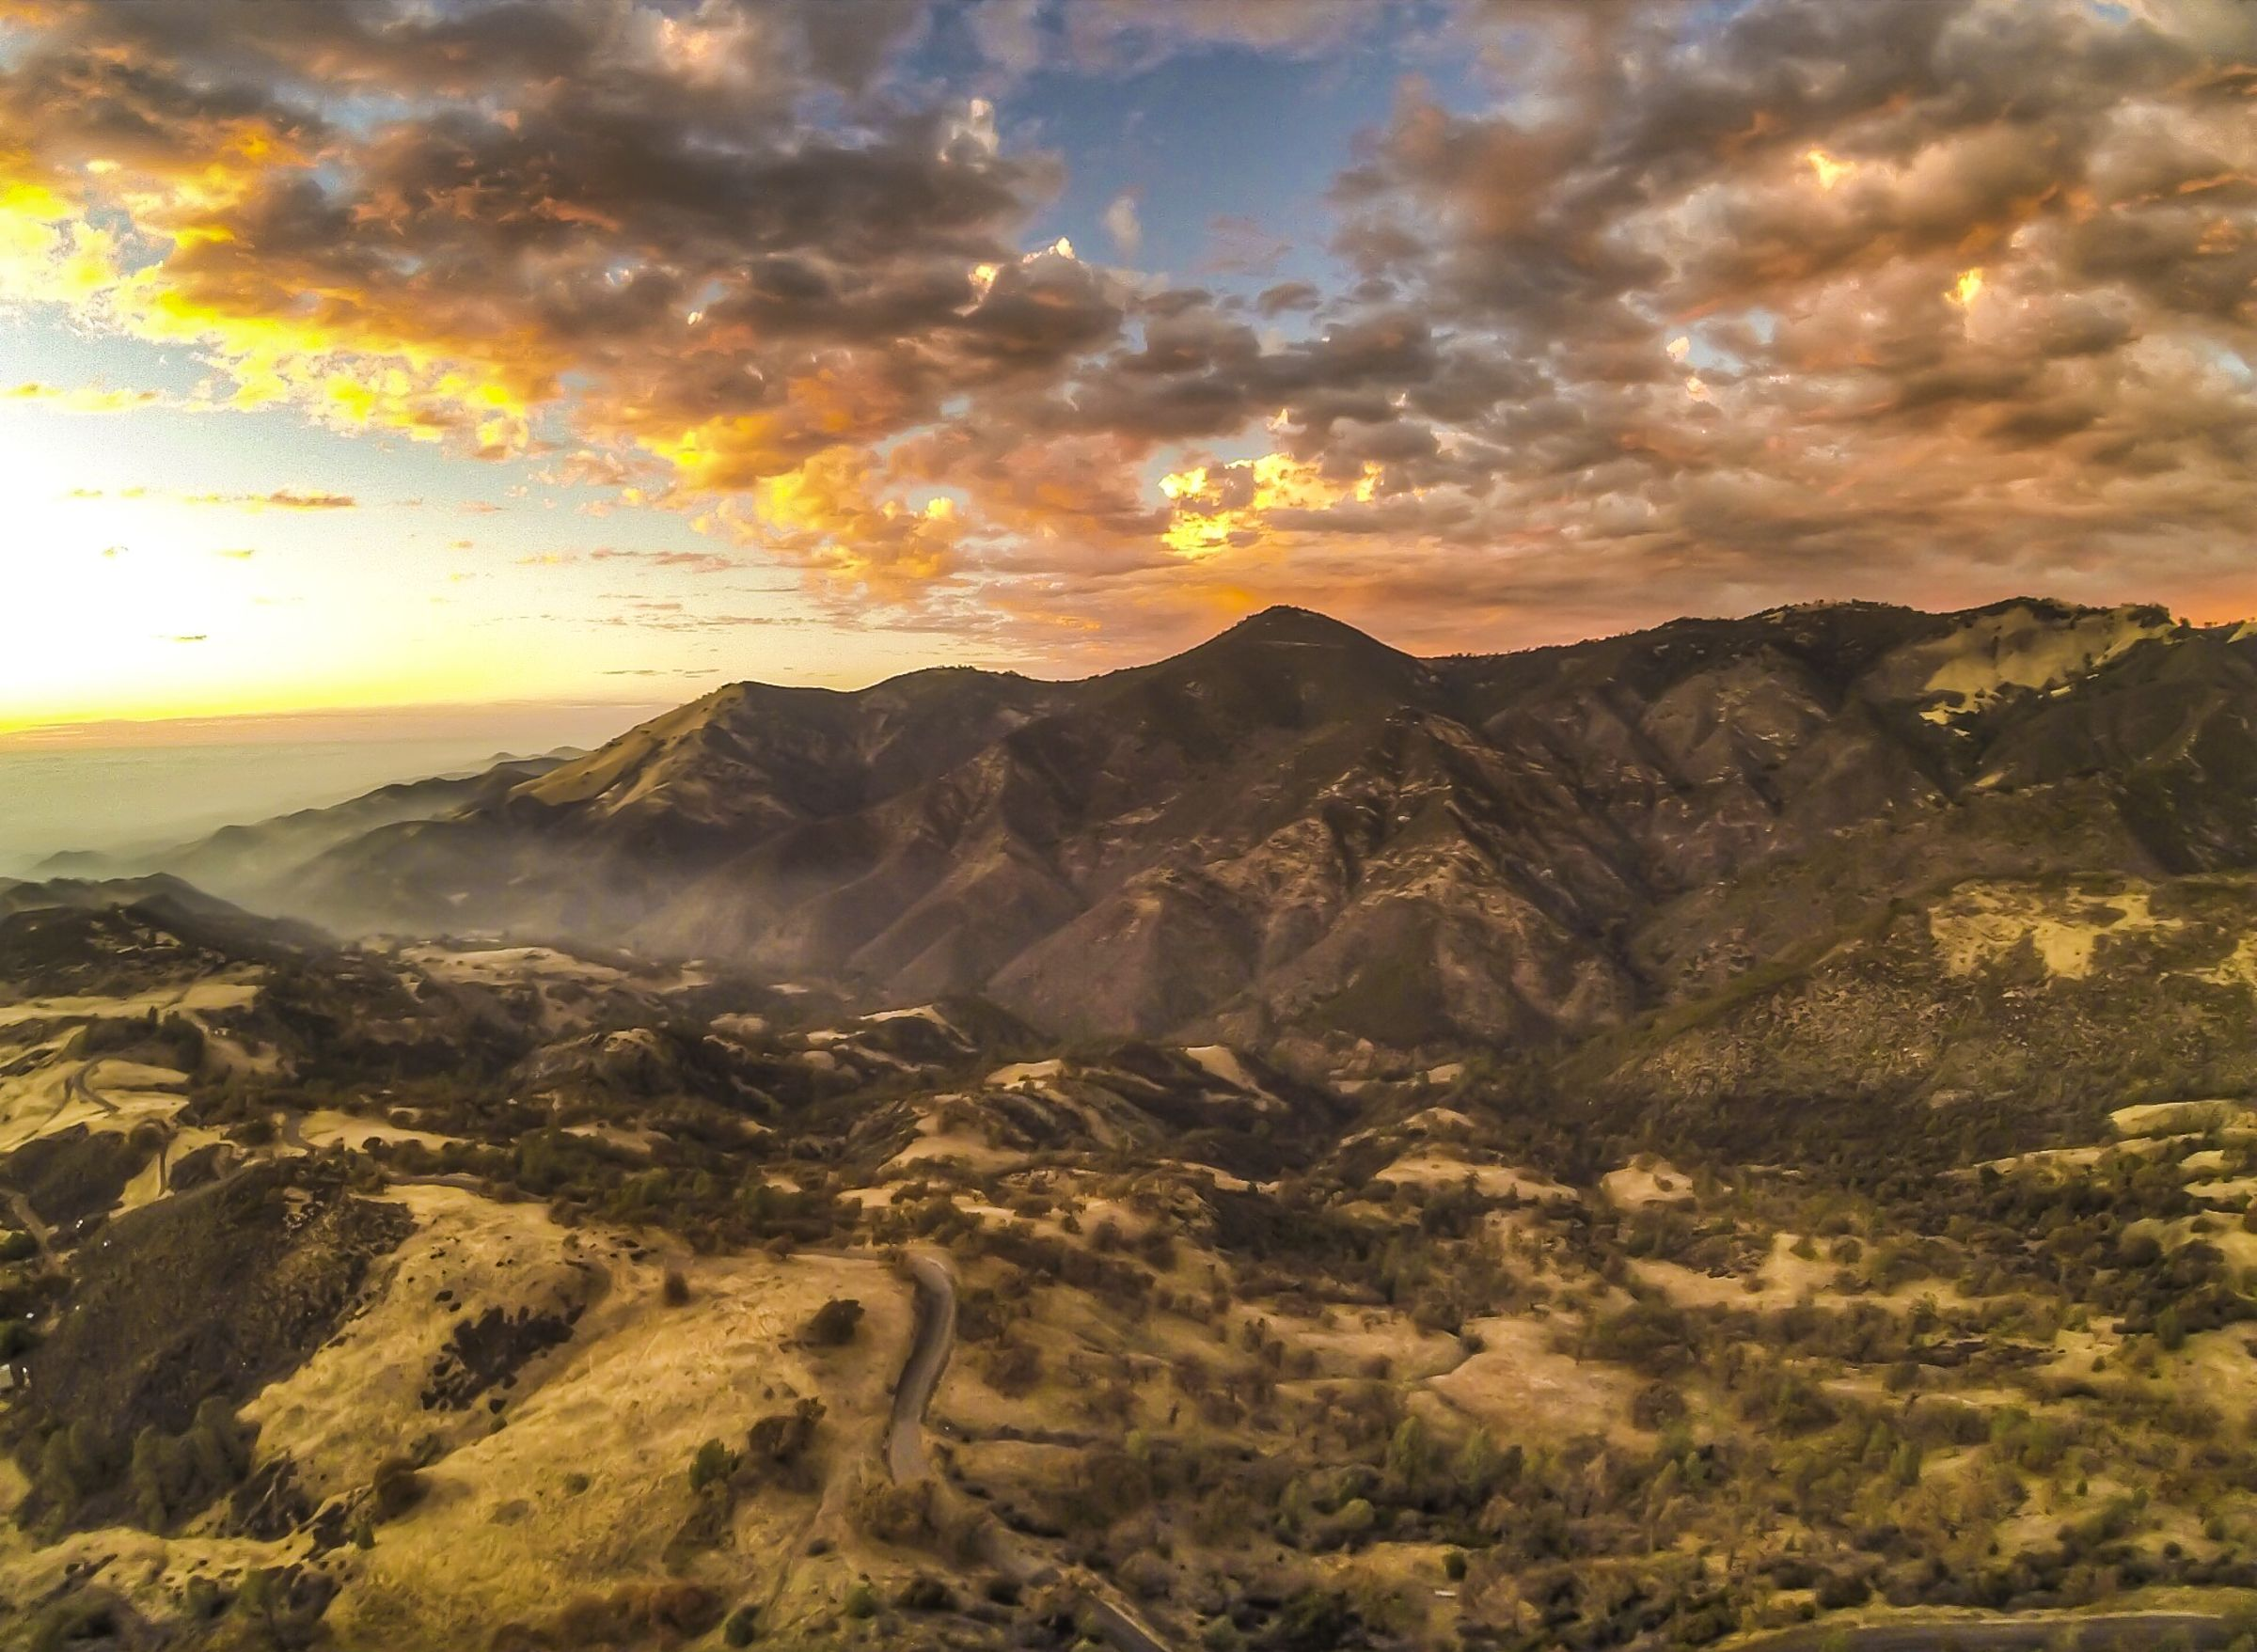 Figueroa Mountain. Santa Ynez, California.